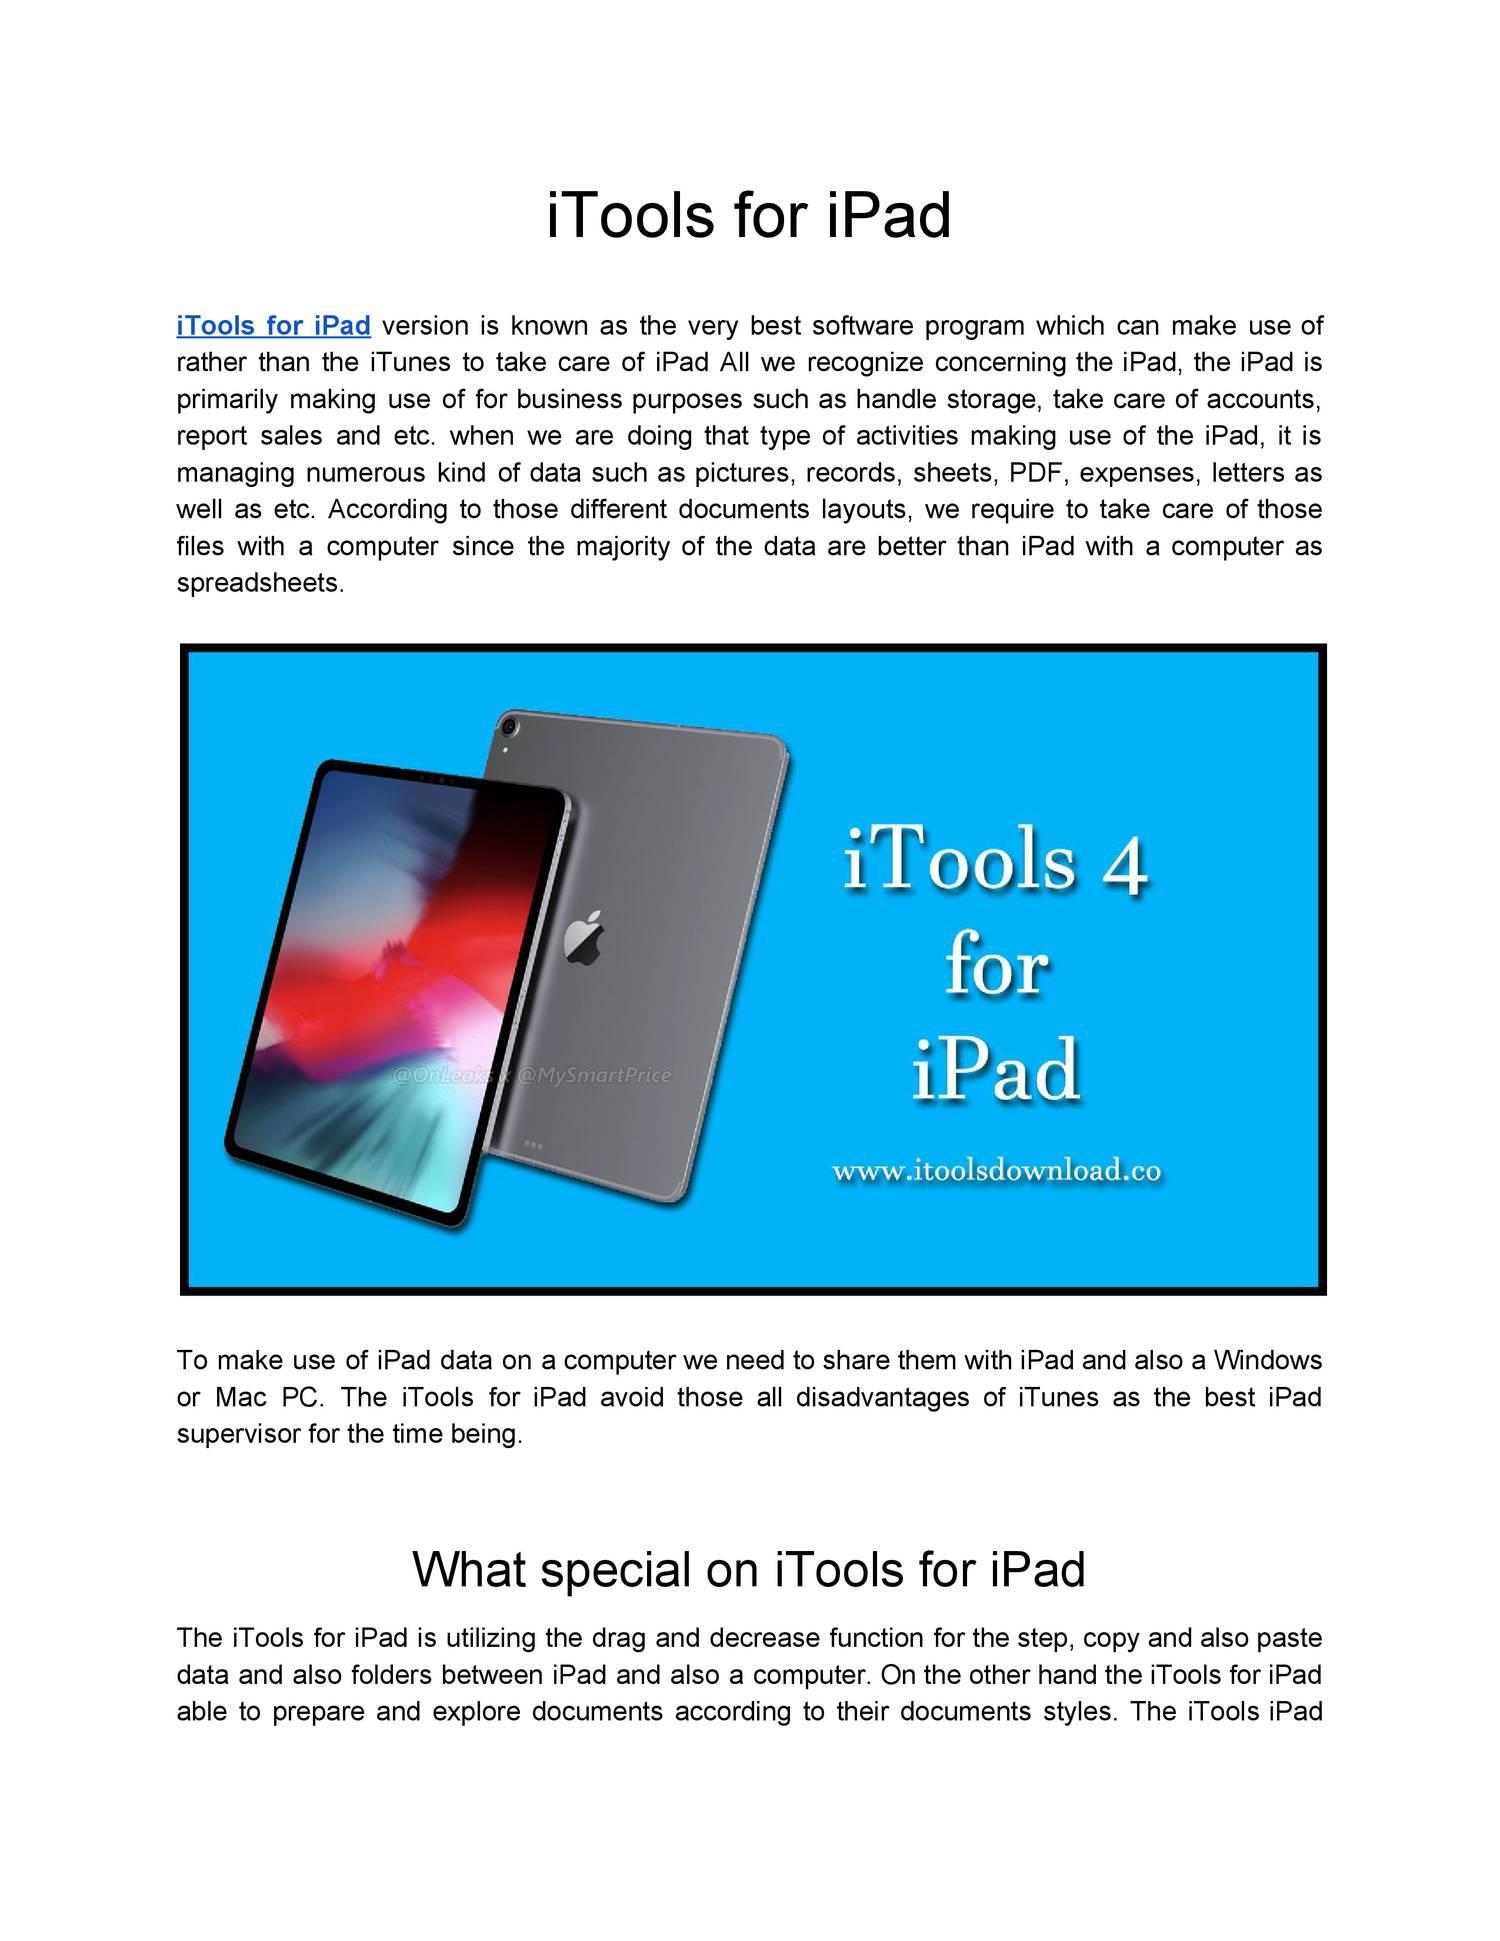 iTools for iPad pdf | DocDroid